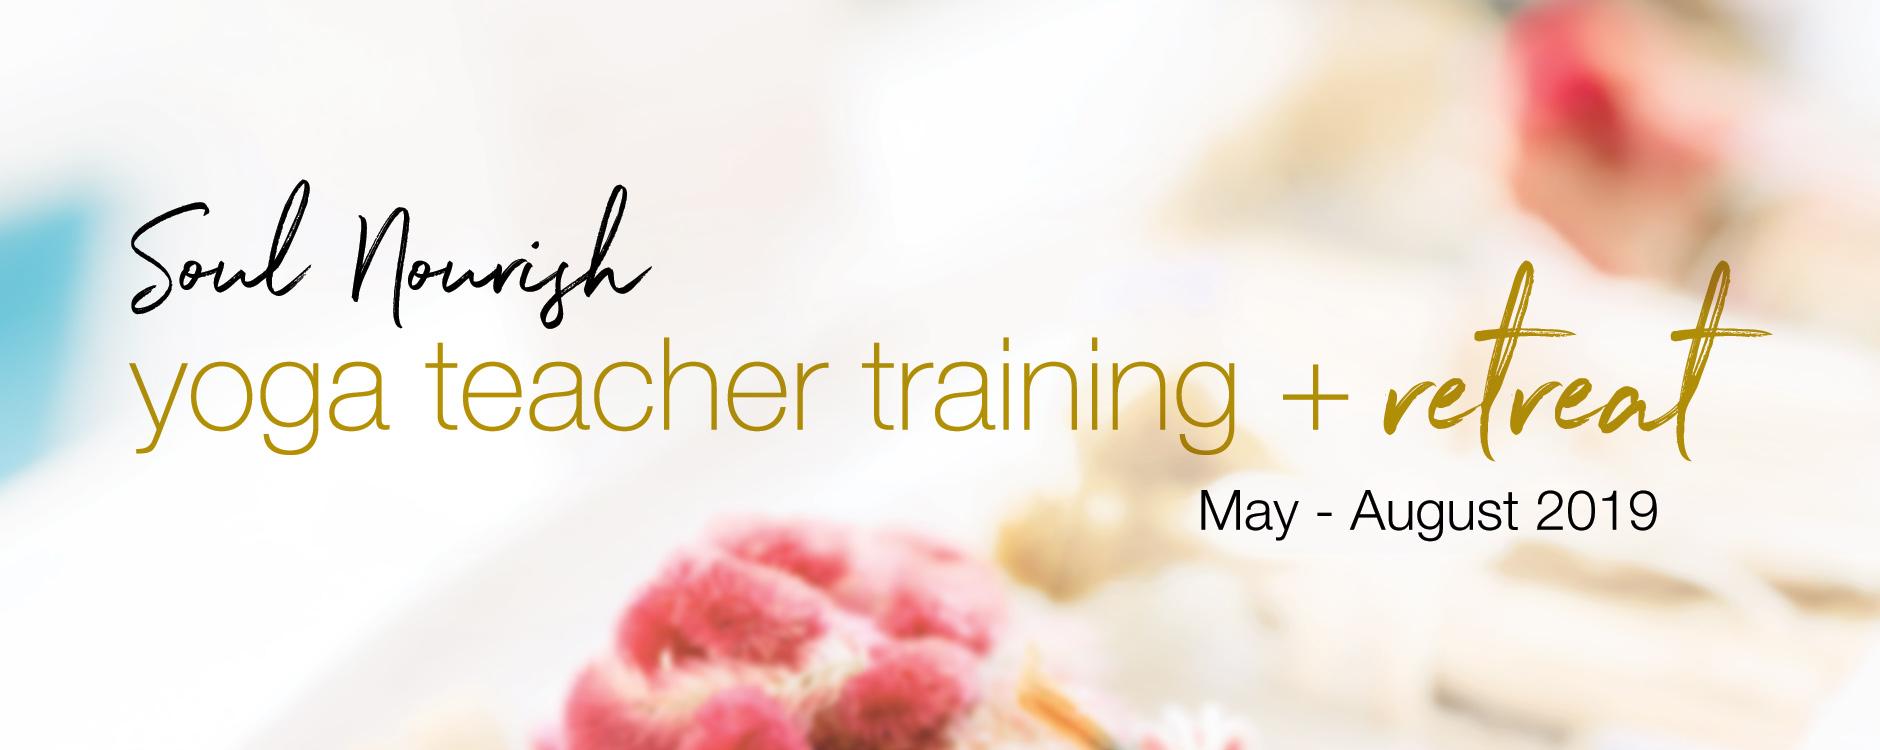 Soul Nourish Yoga Teacher Training